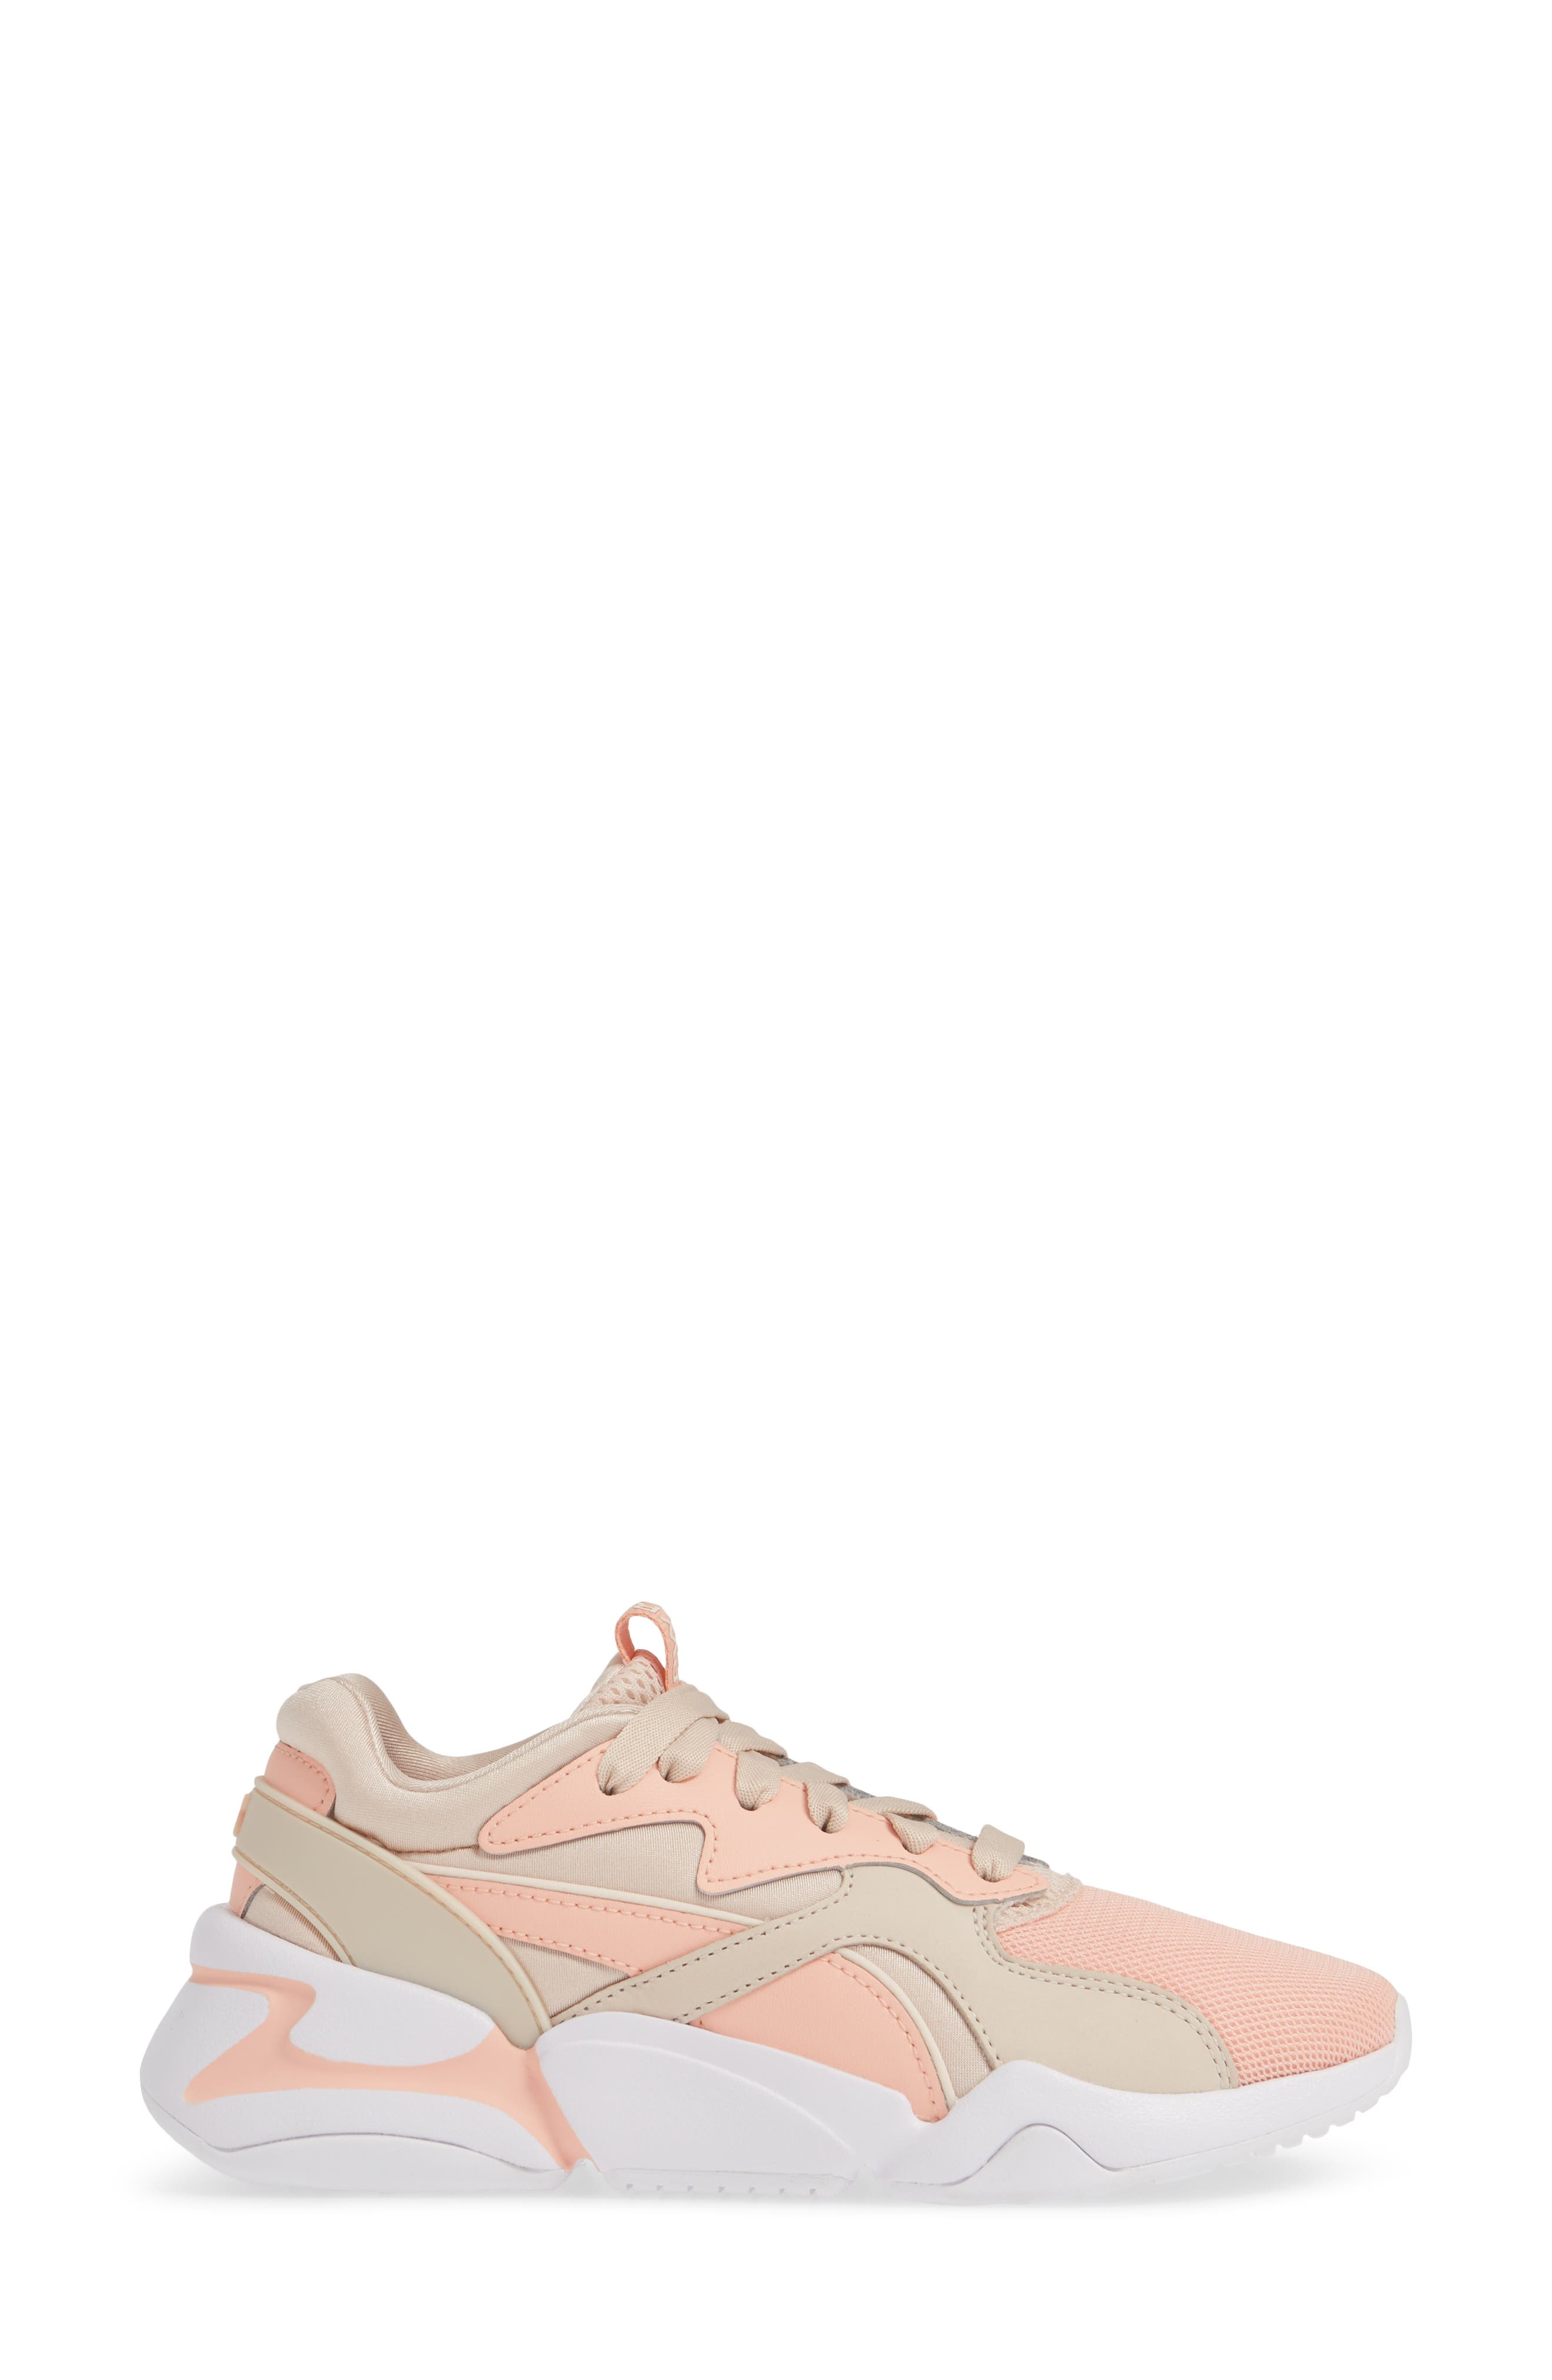 PUMA, Nova GRL PWR Sneaker, Alternate thumbnail 3, color, PEACH BUD/ PEARL BLUSH